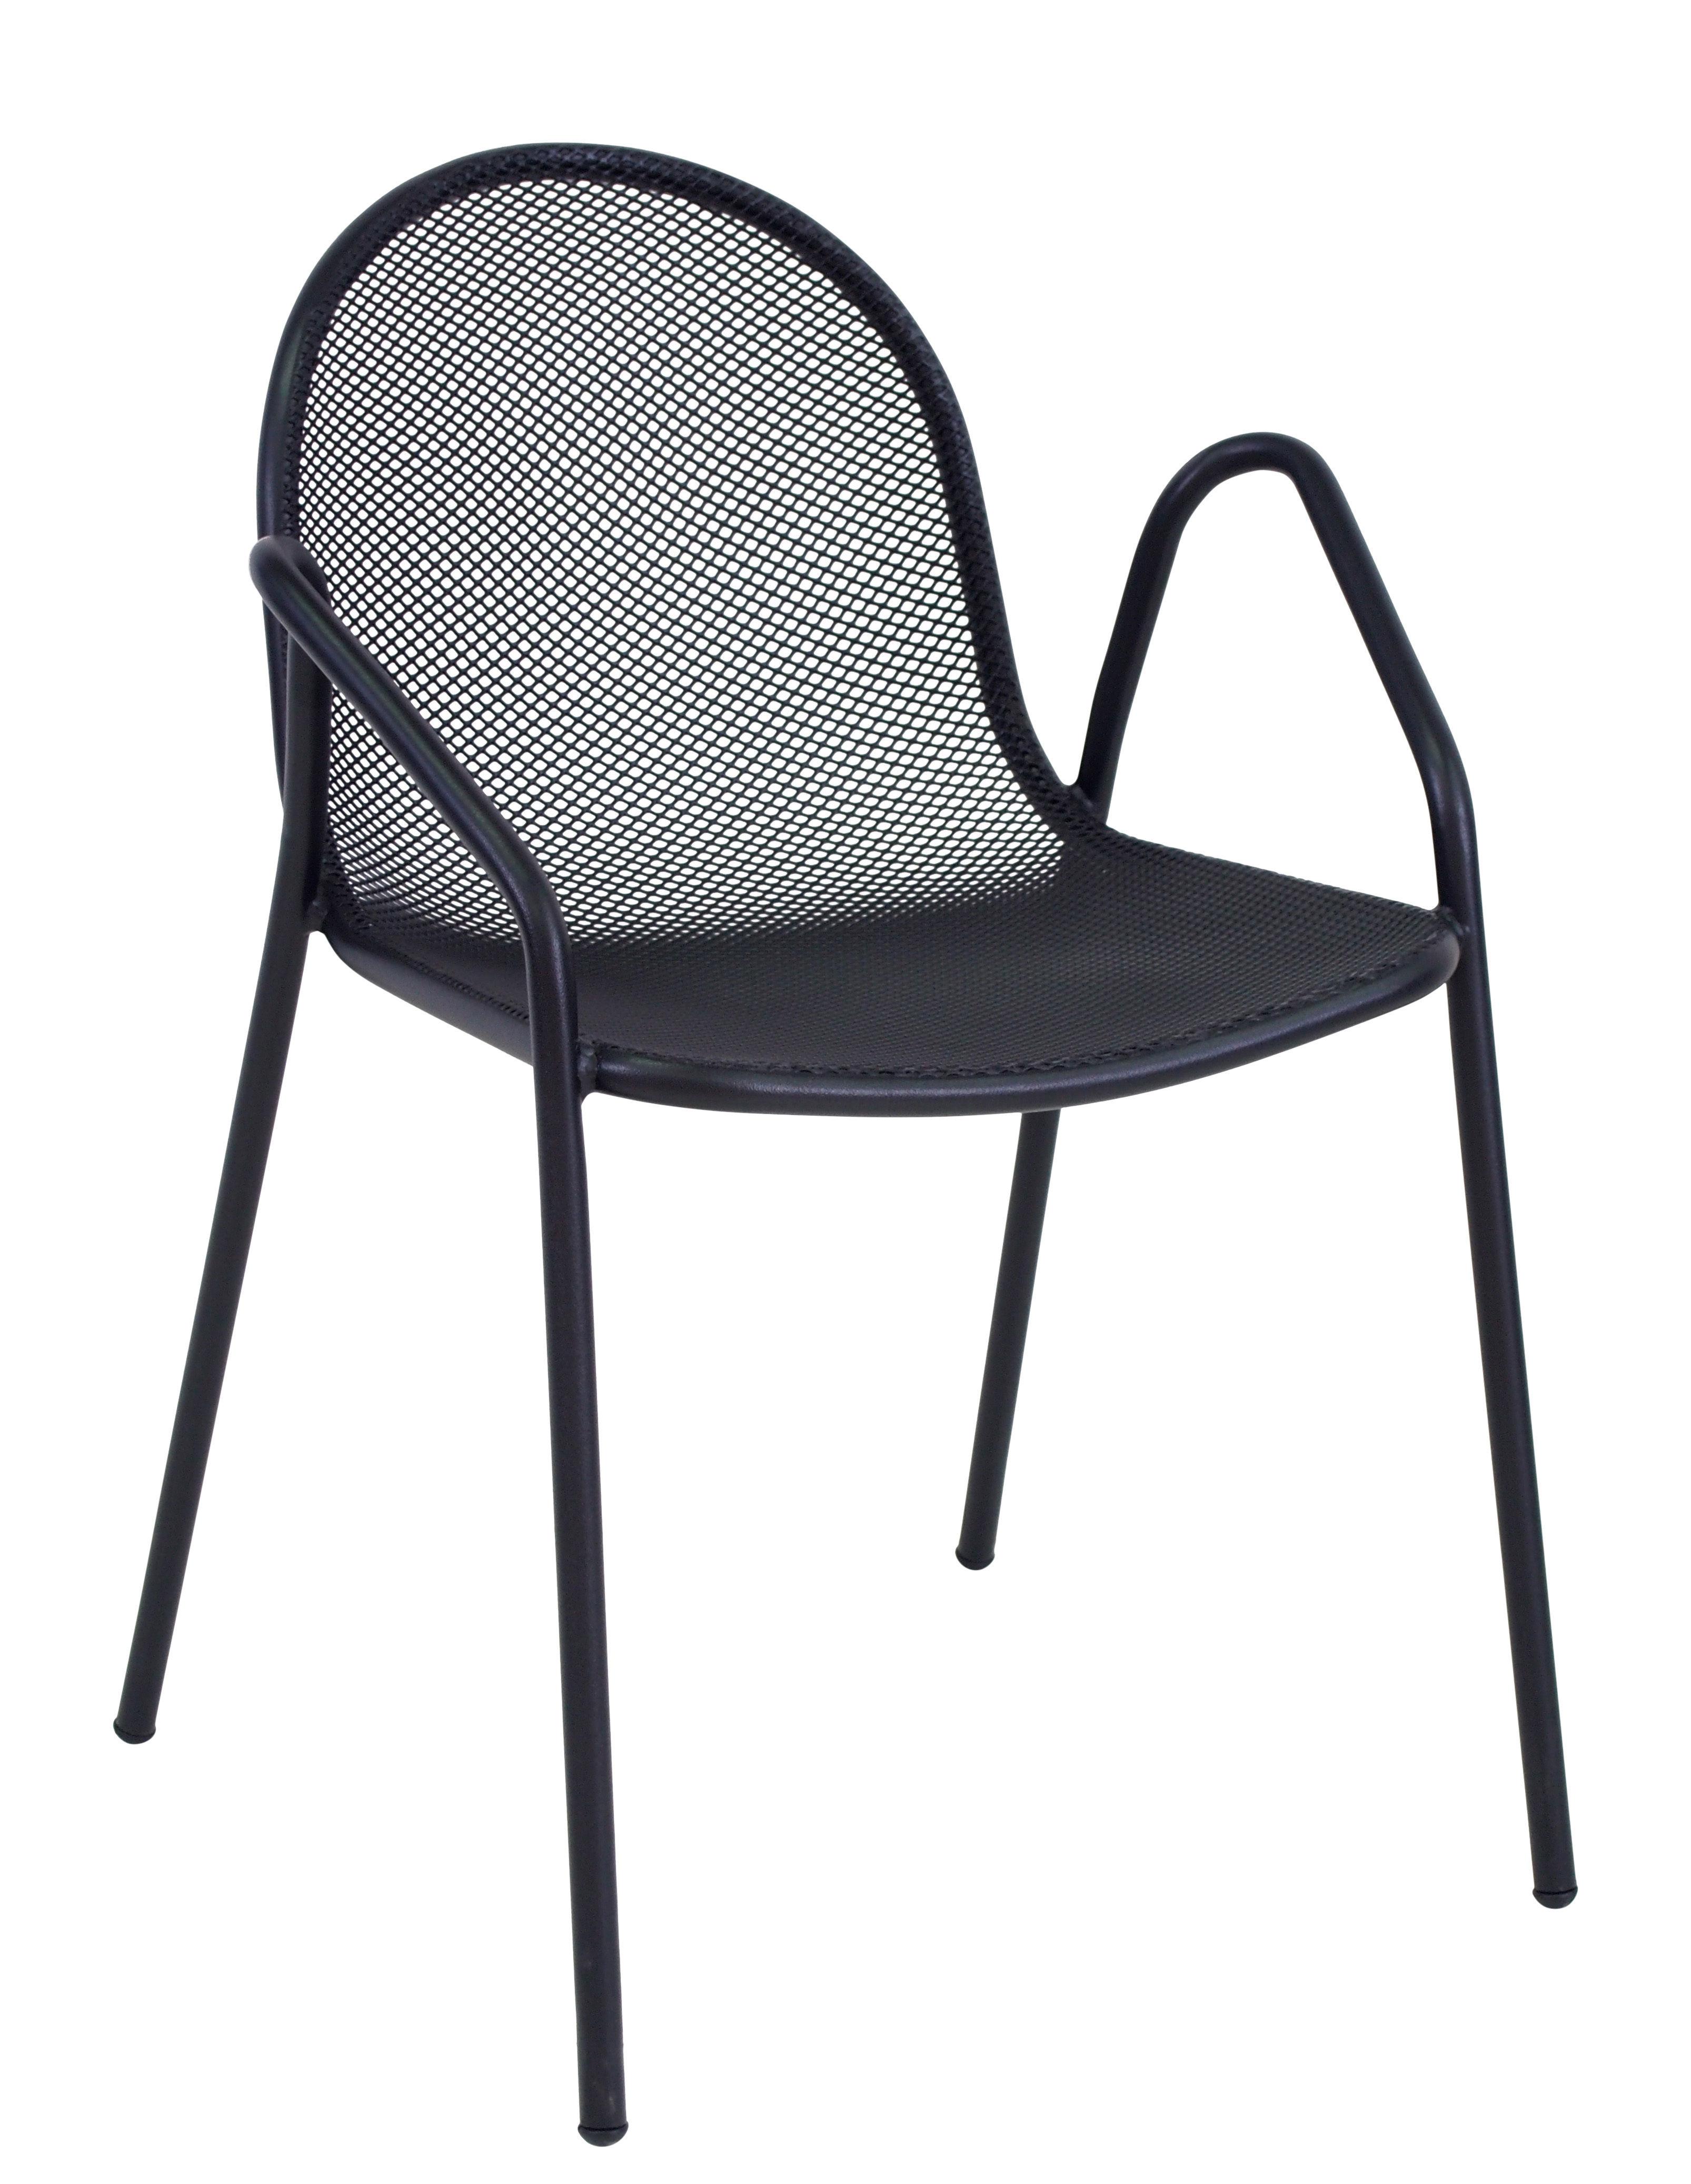 Furniture - Chairs - Nova Stackable armchair - / Metal by Emu - Black - Varnished steel